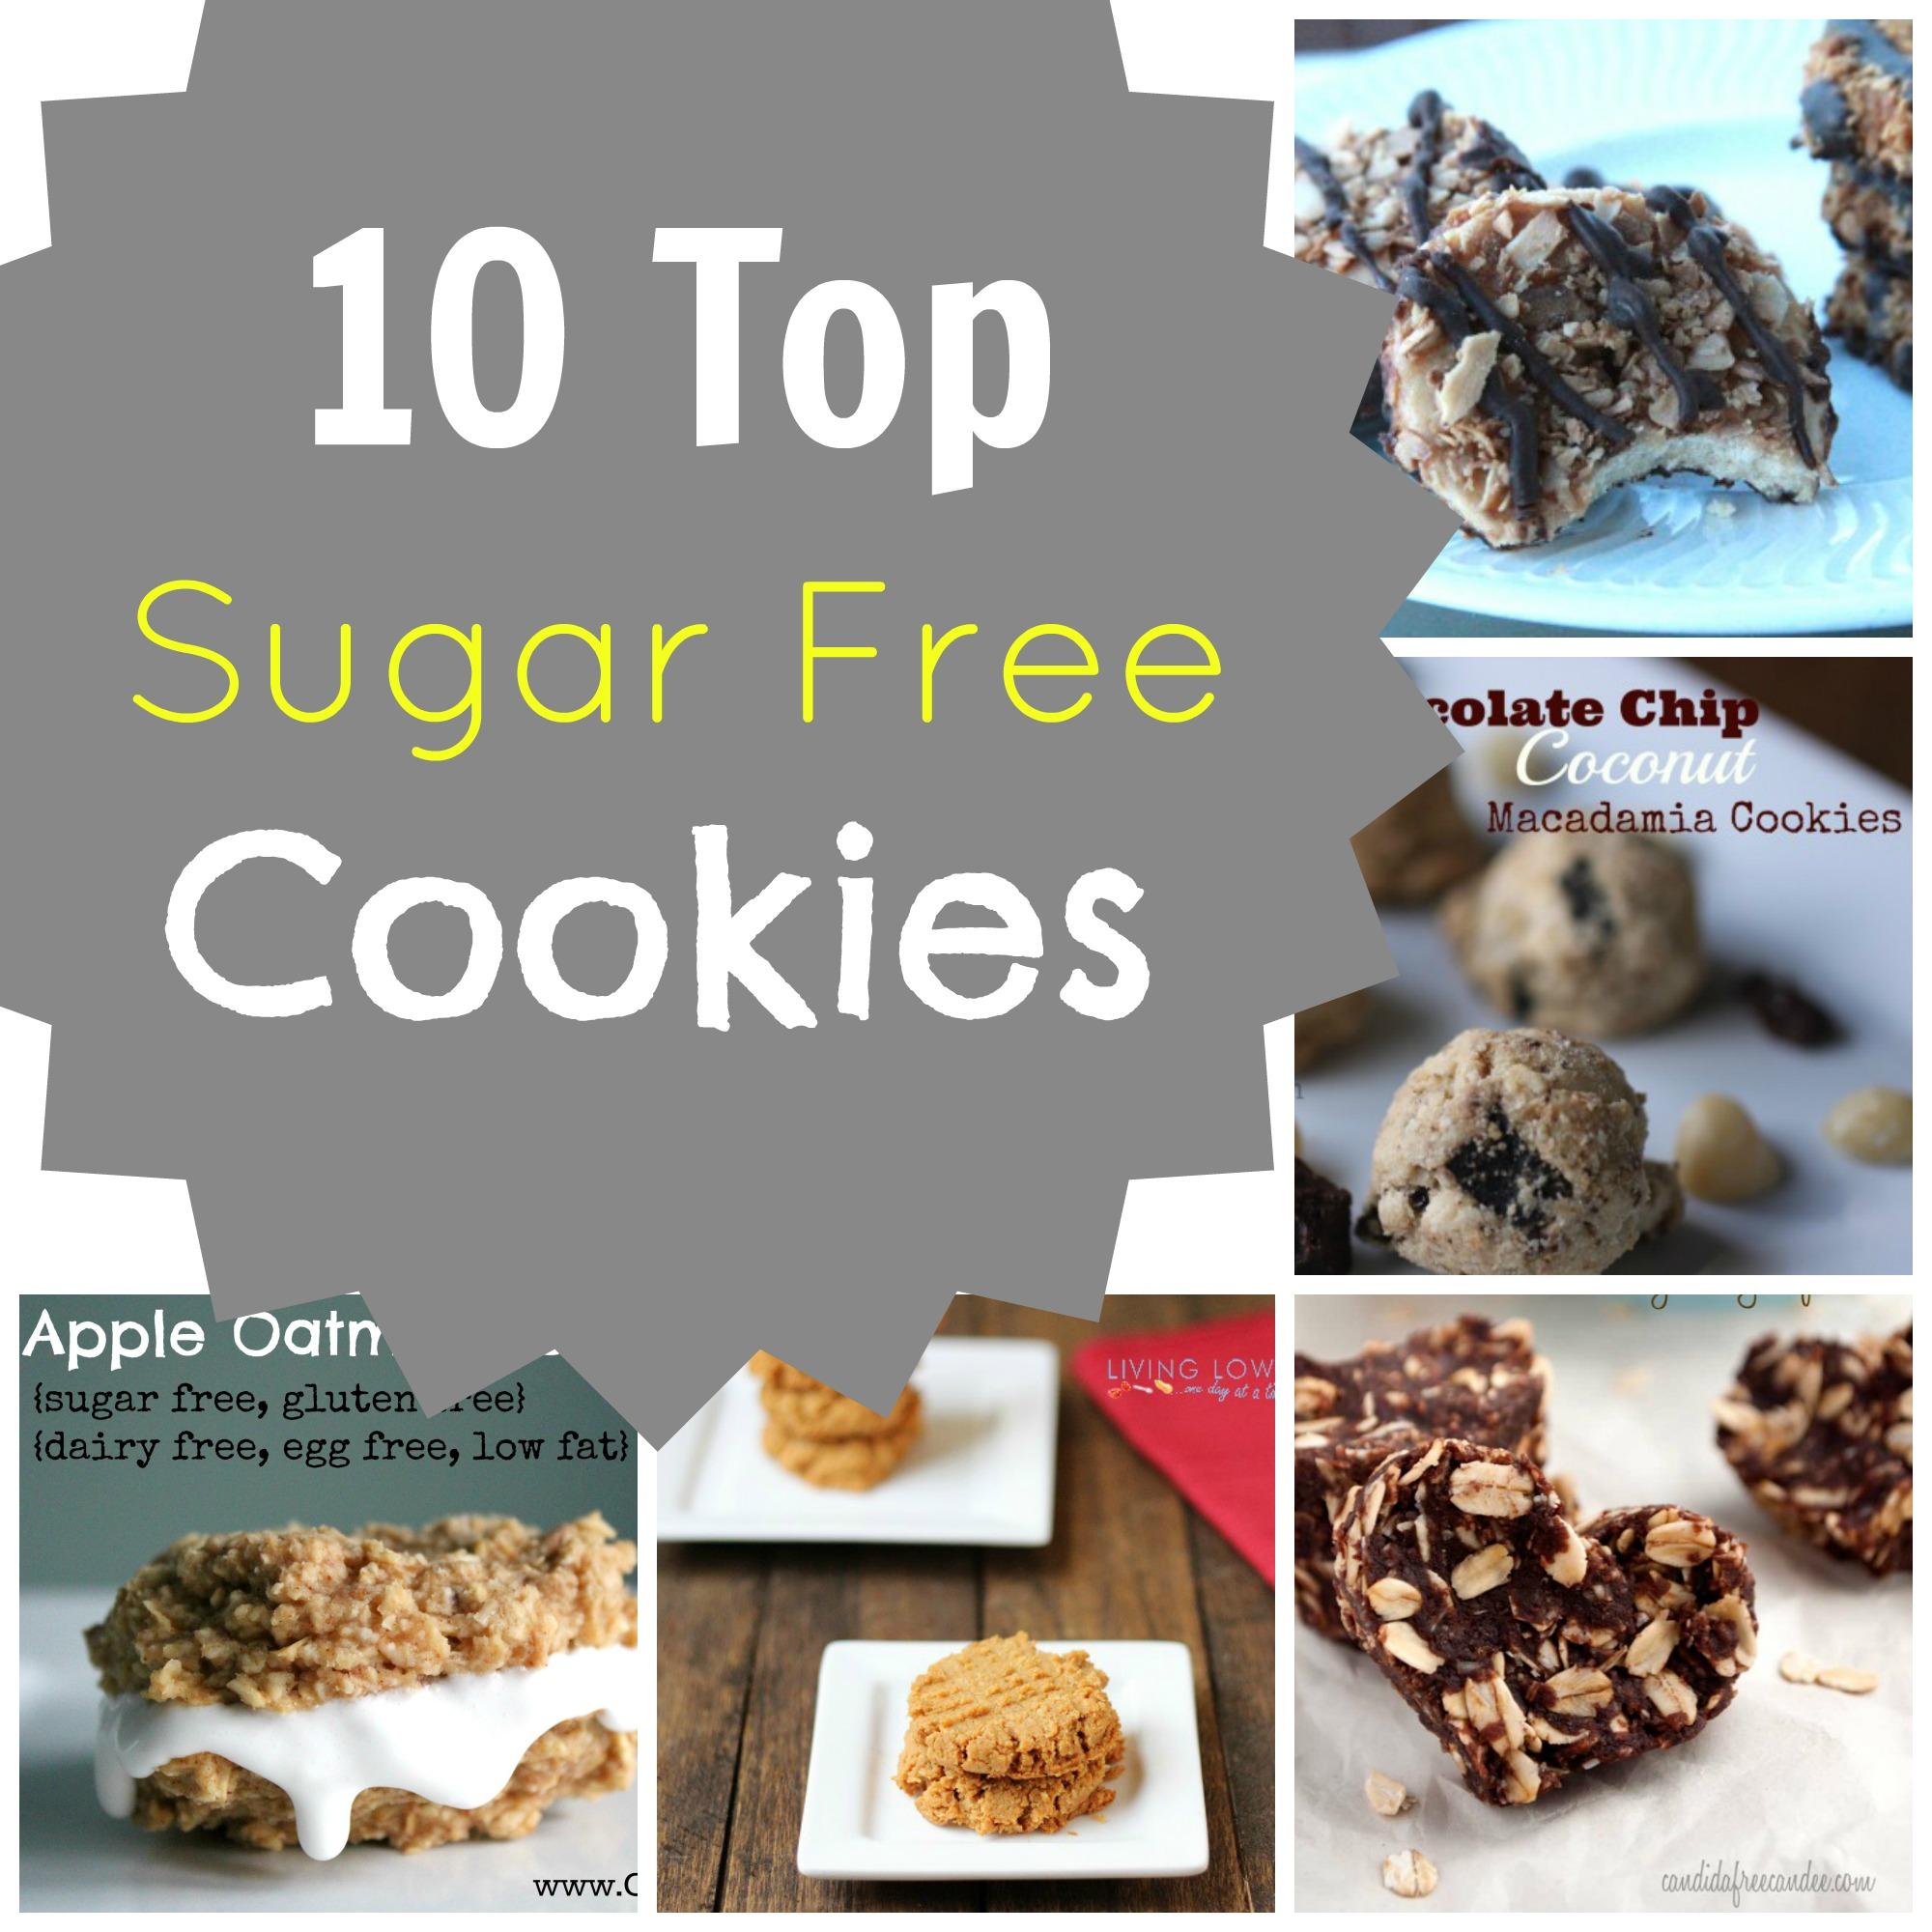 10 Top Sugar Free Cookies Grassfed Mama